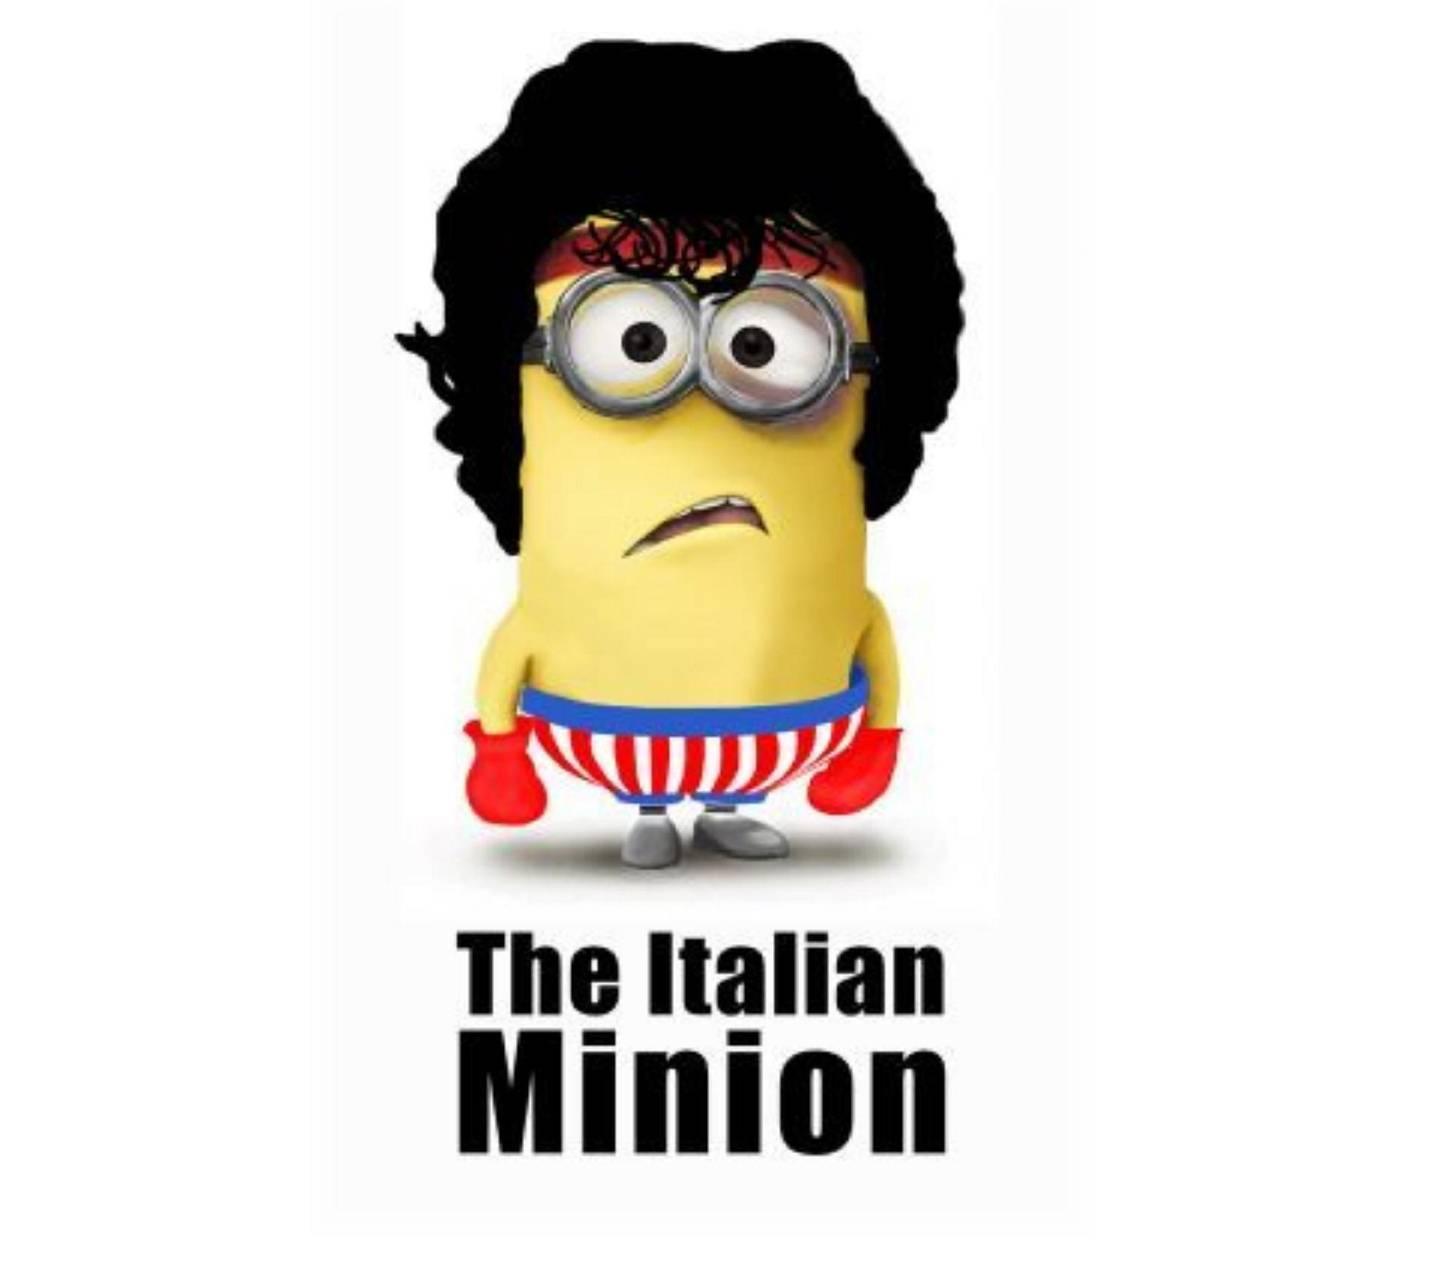 The Italian Minion